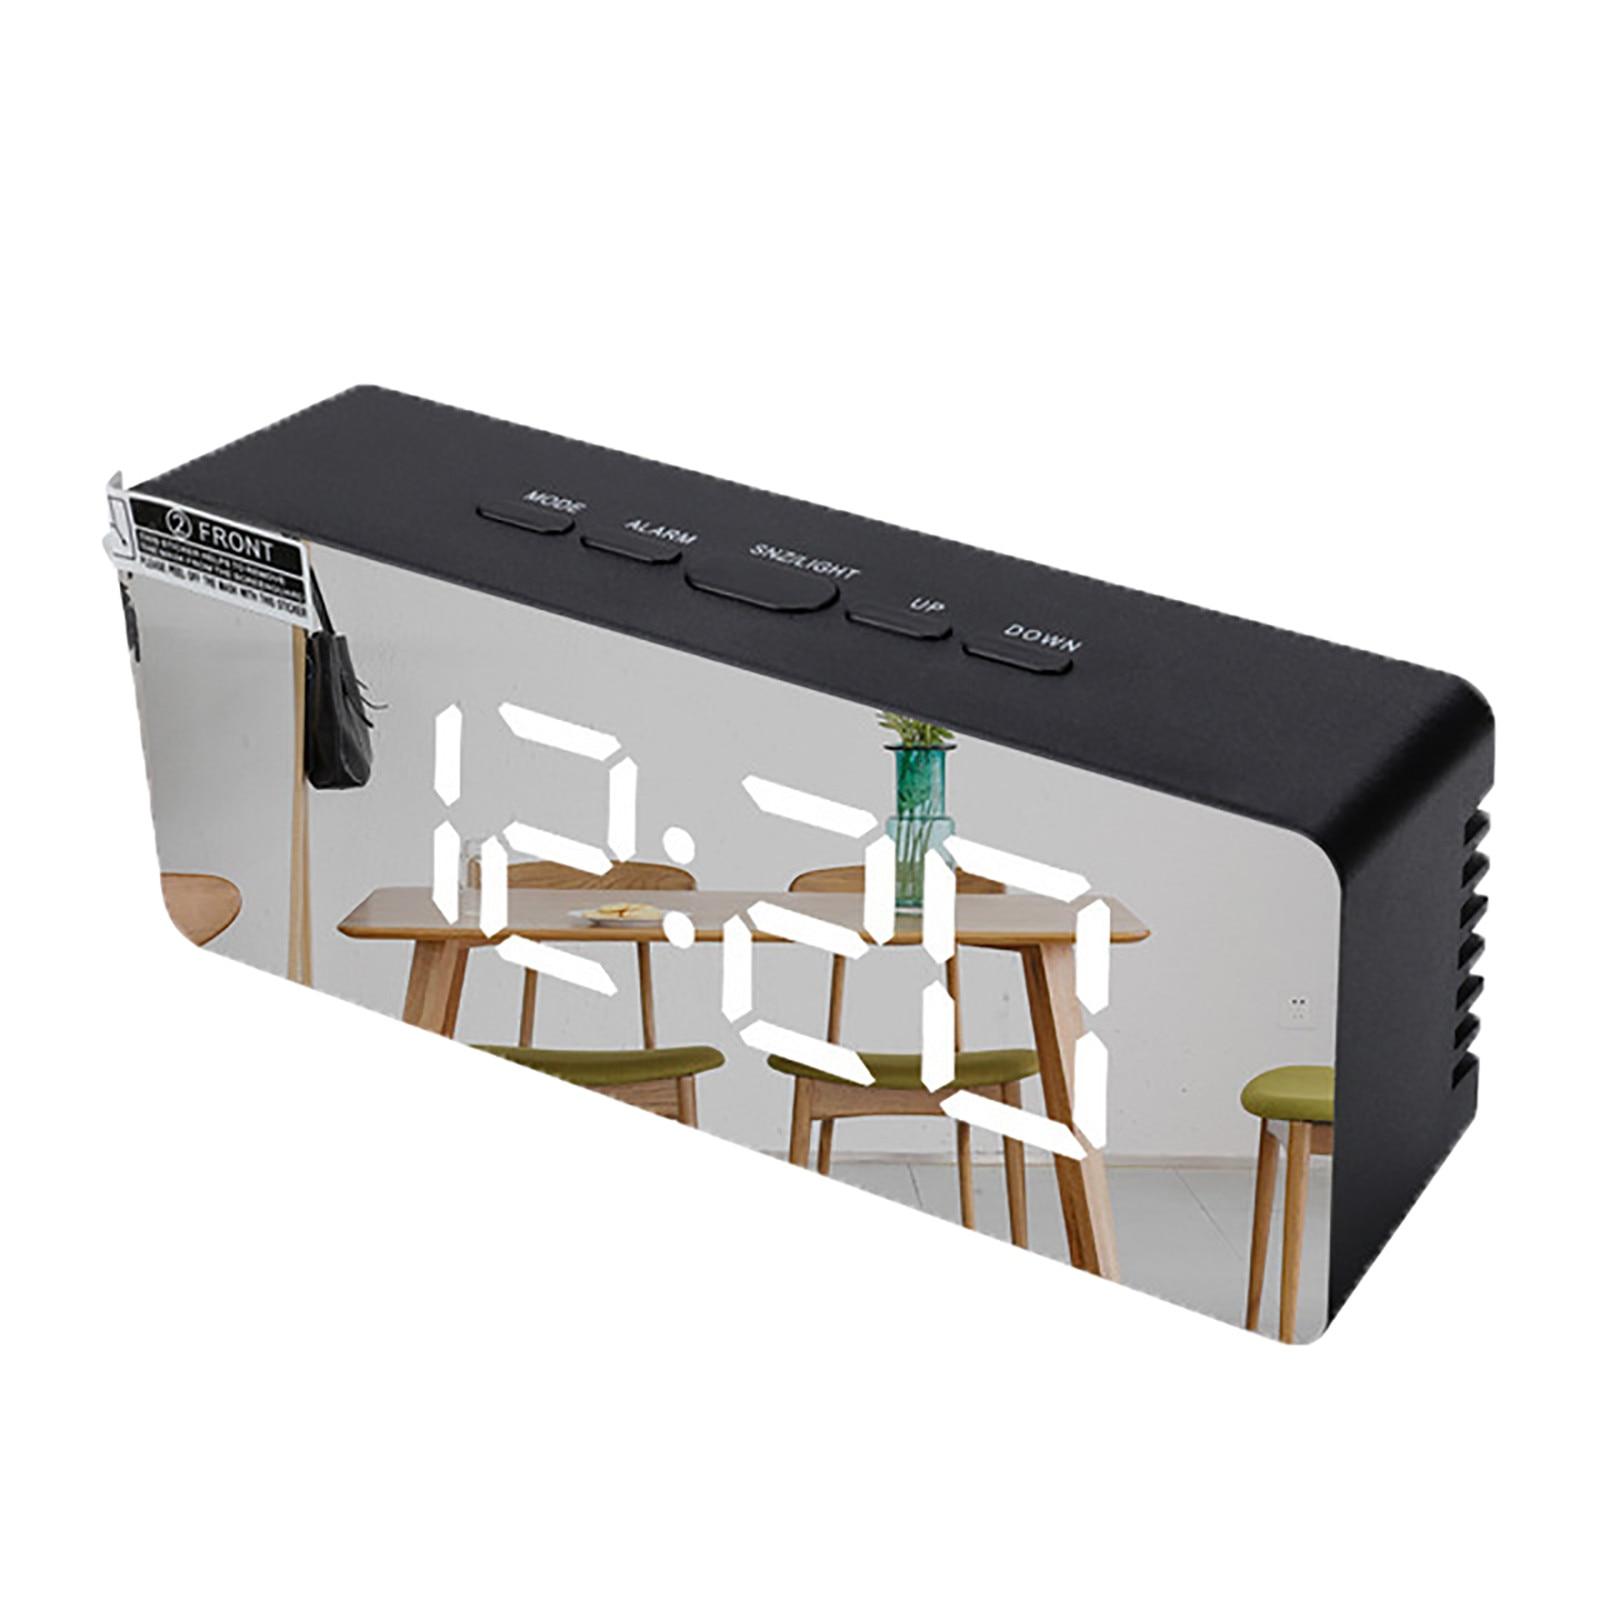 Led Mirror Alarm Clock Digital Snooze Table Clock Wake Up Light Electronic Large Time Temperature Display Home Decor Clock#0